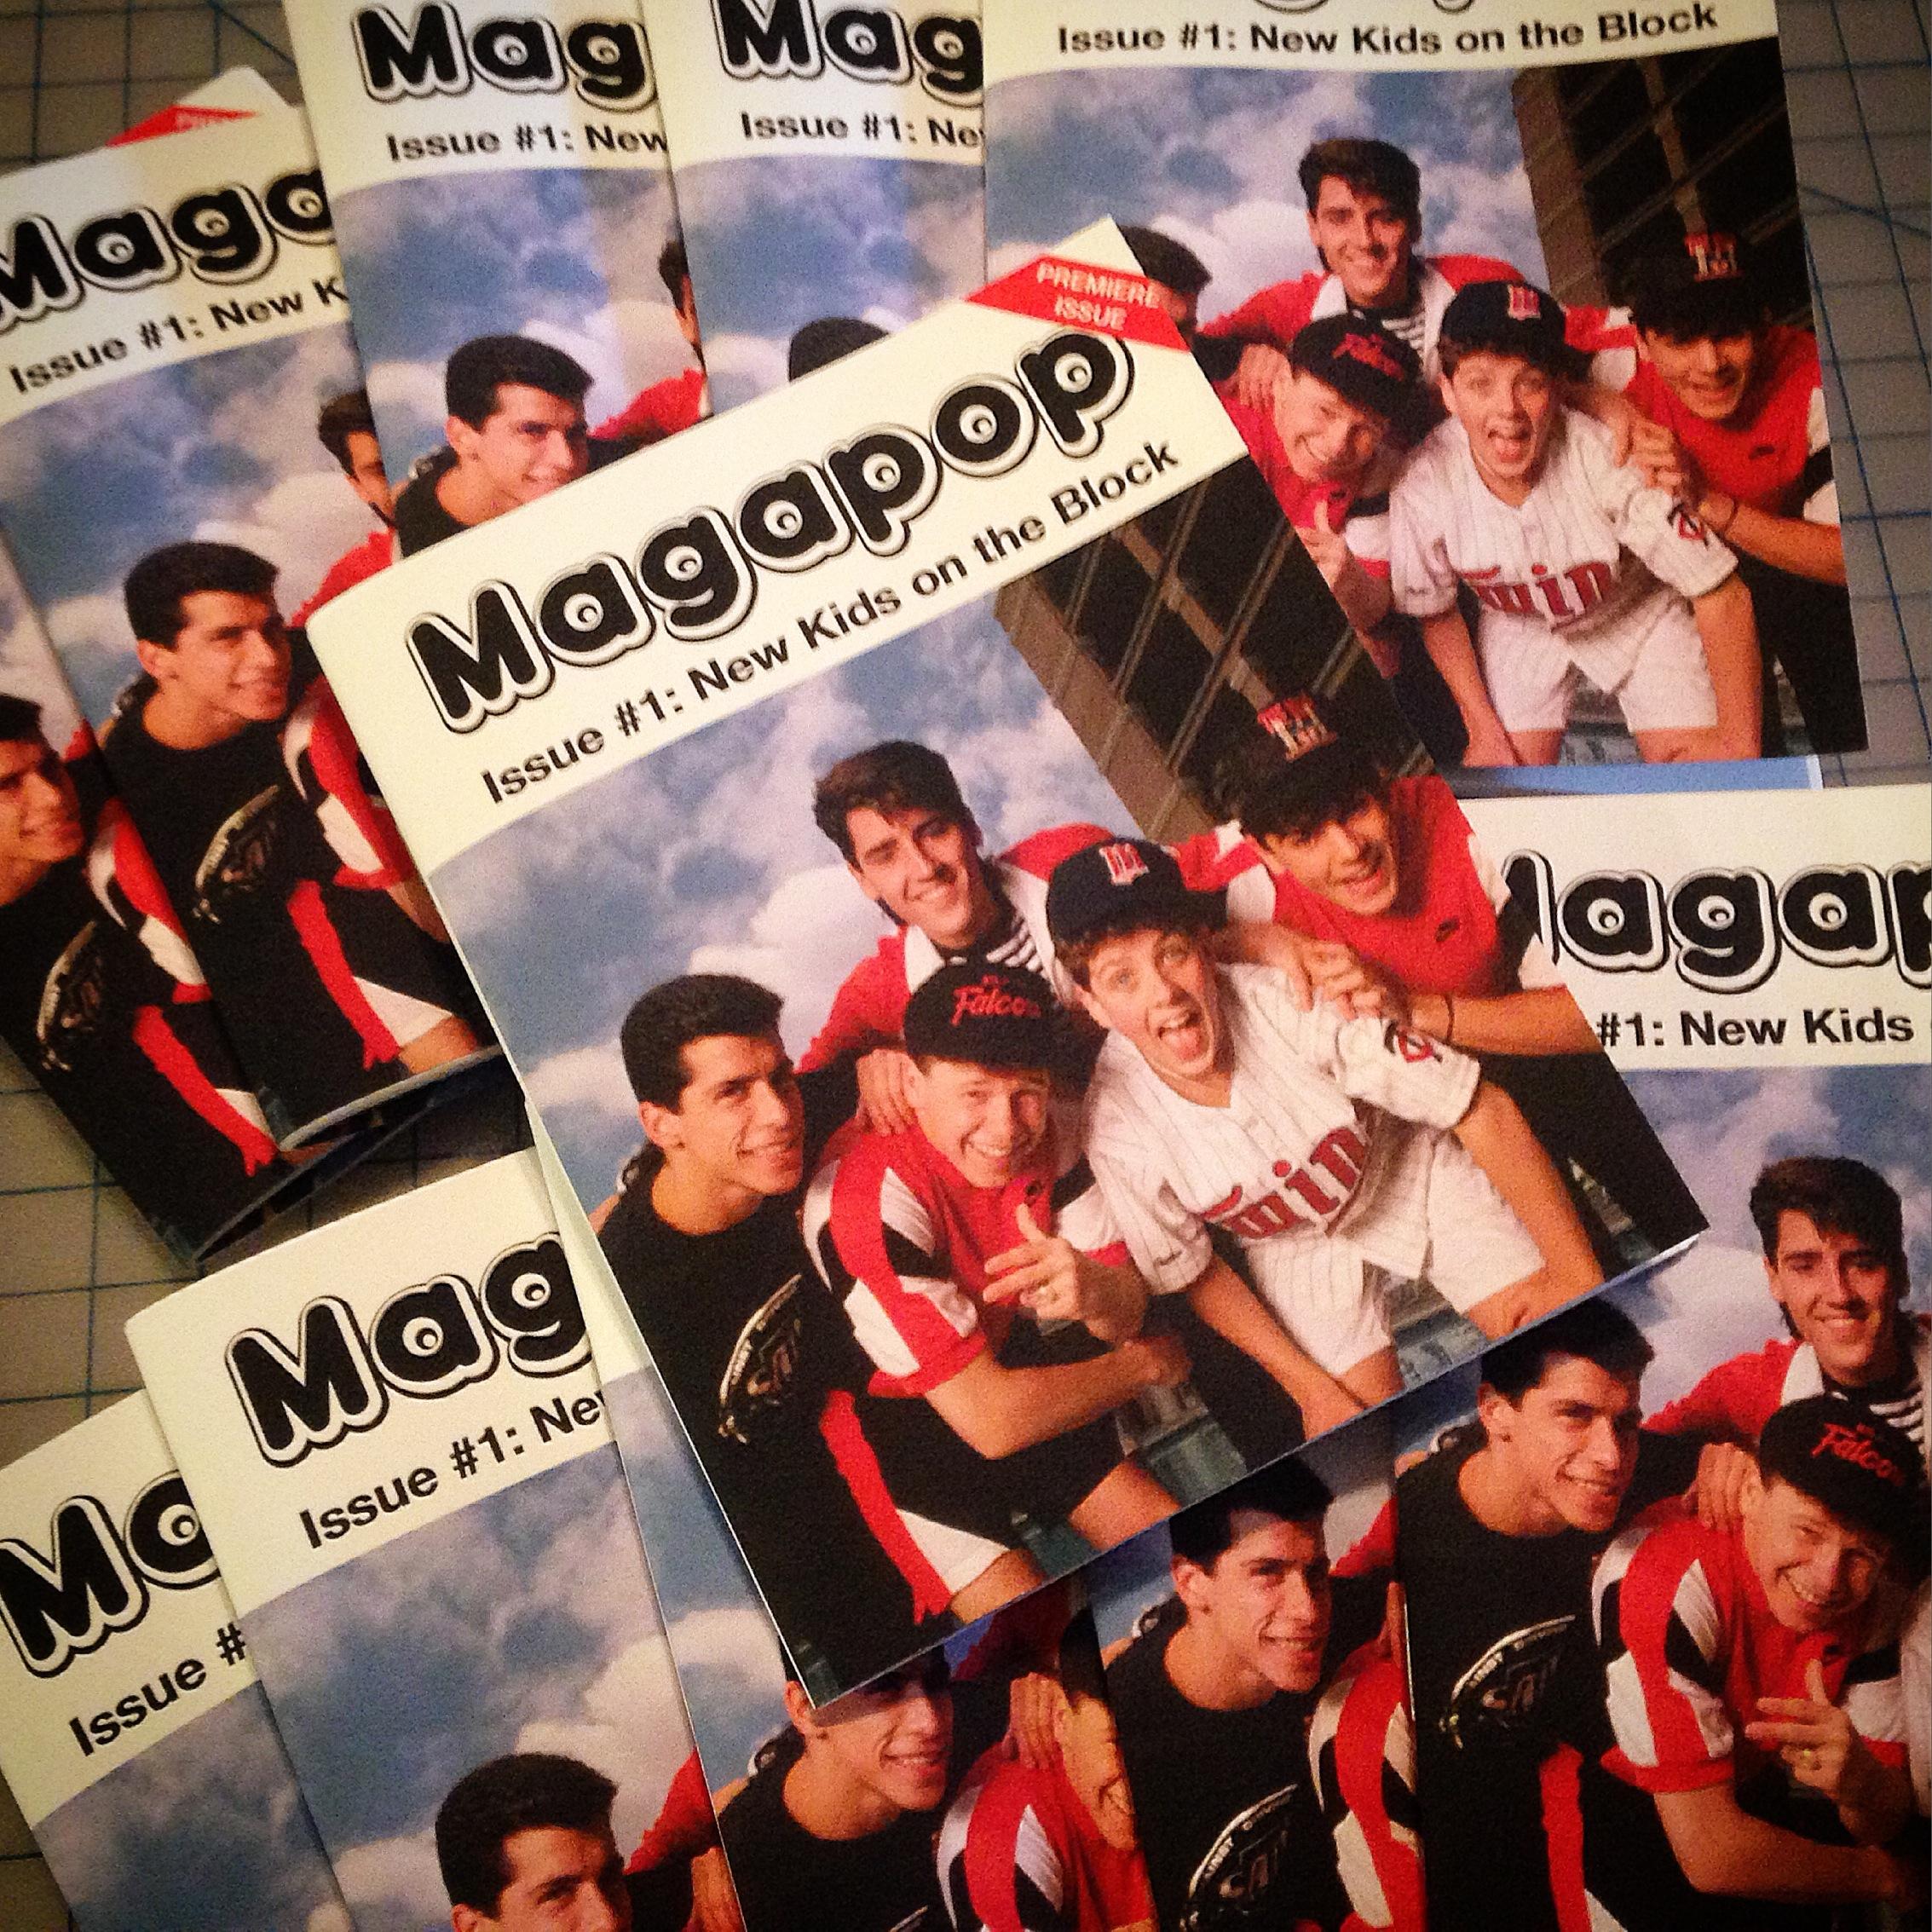 Magapop1